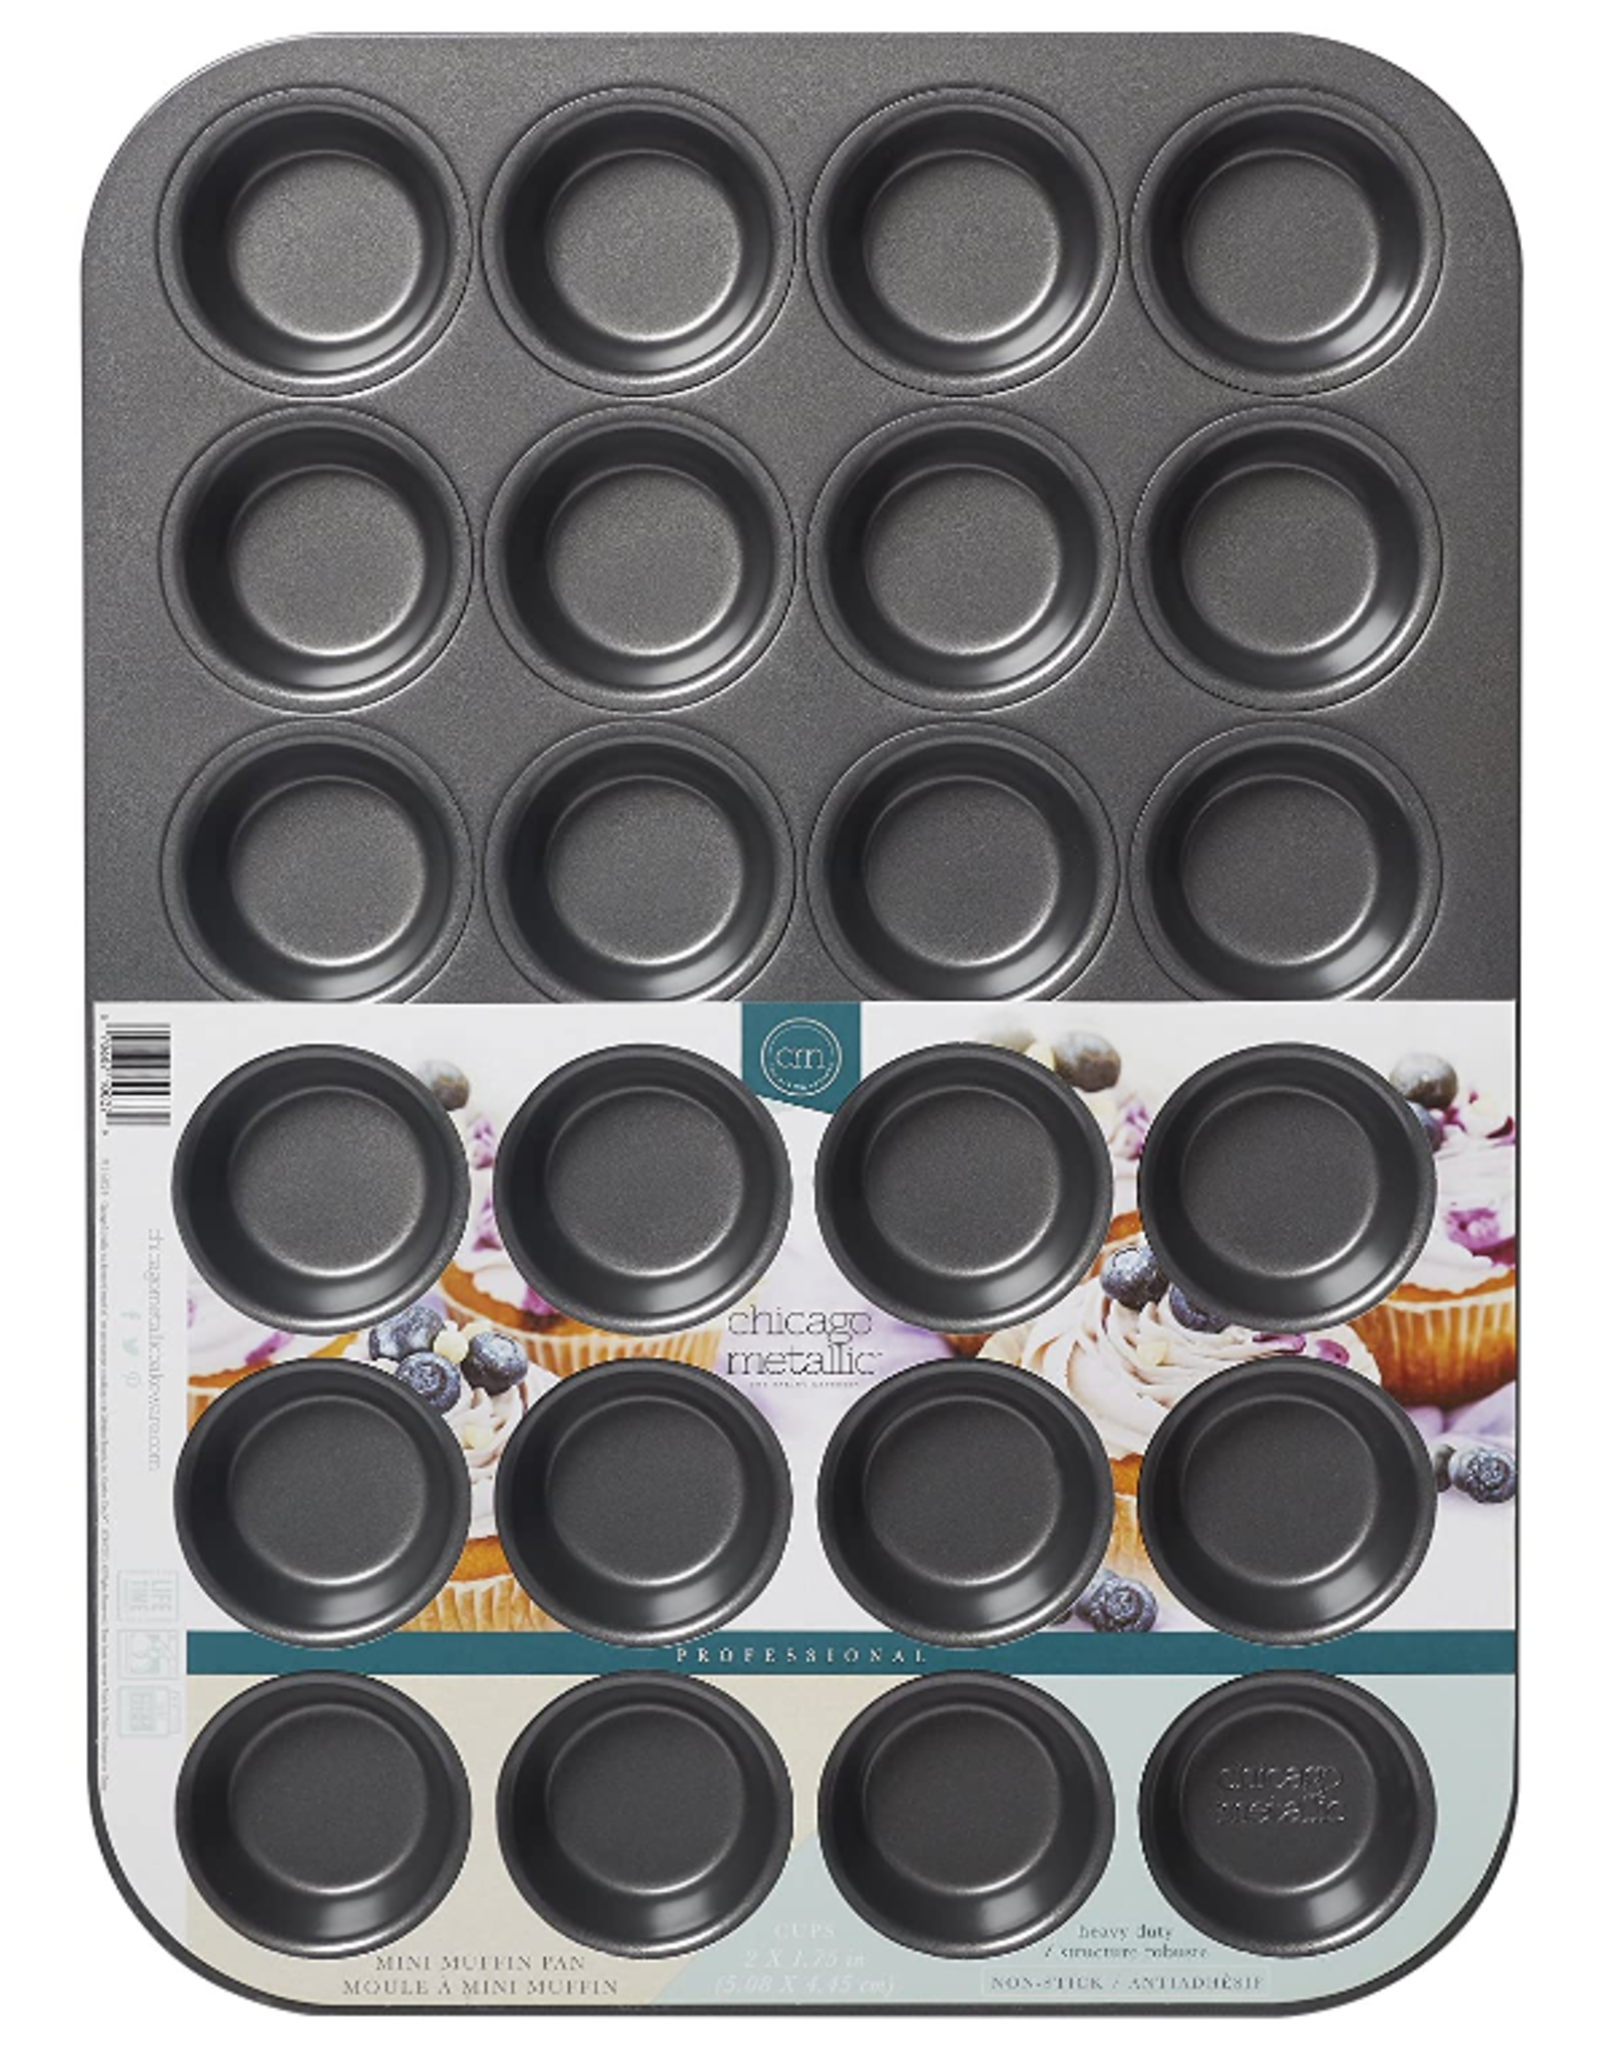 Chicago Metallic ChicMet 24 cup Mini Muffin Pan